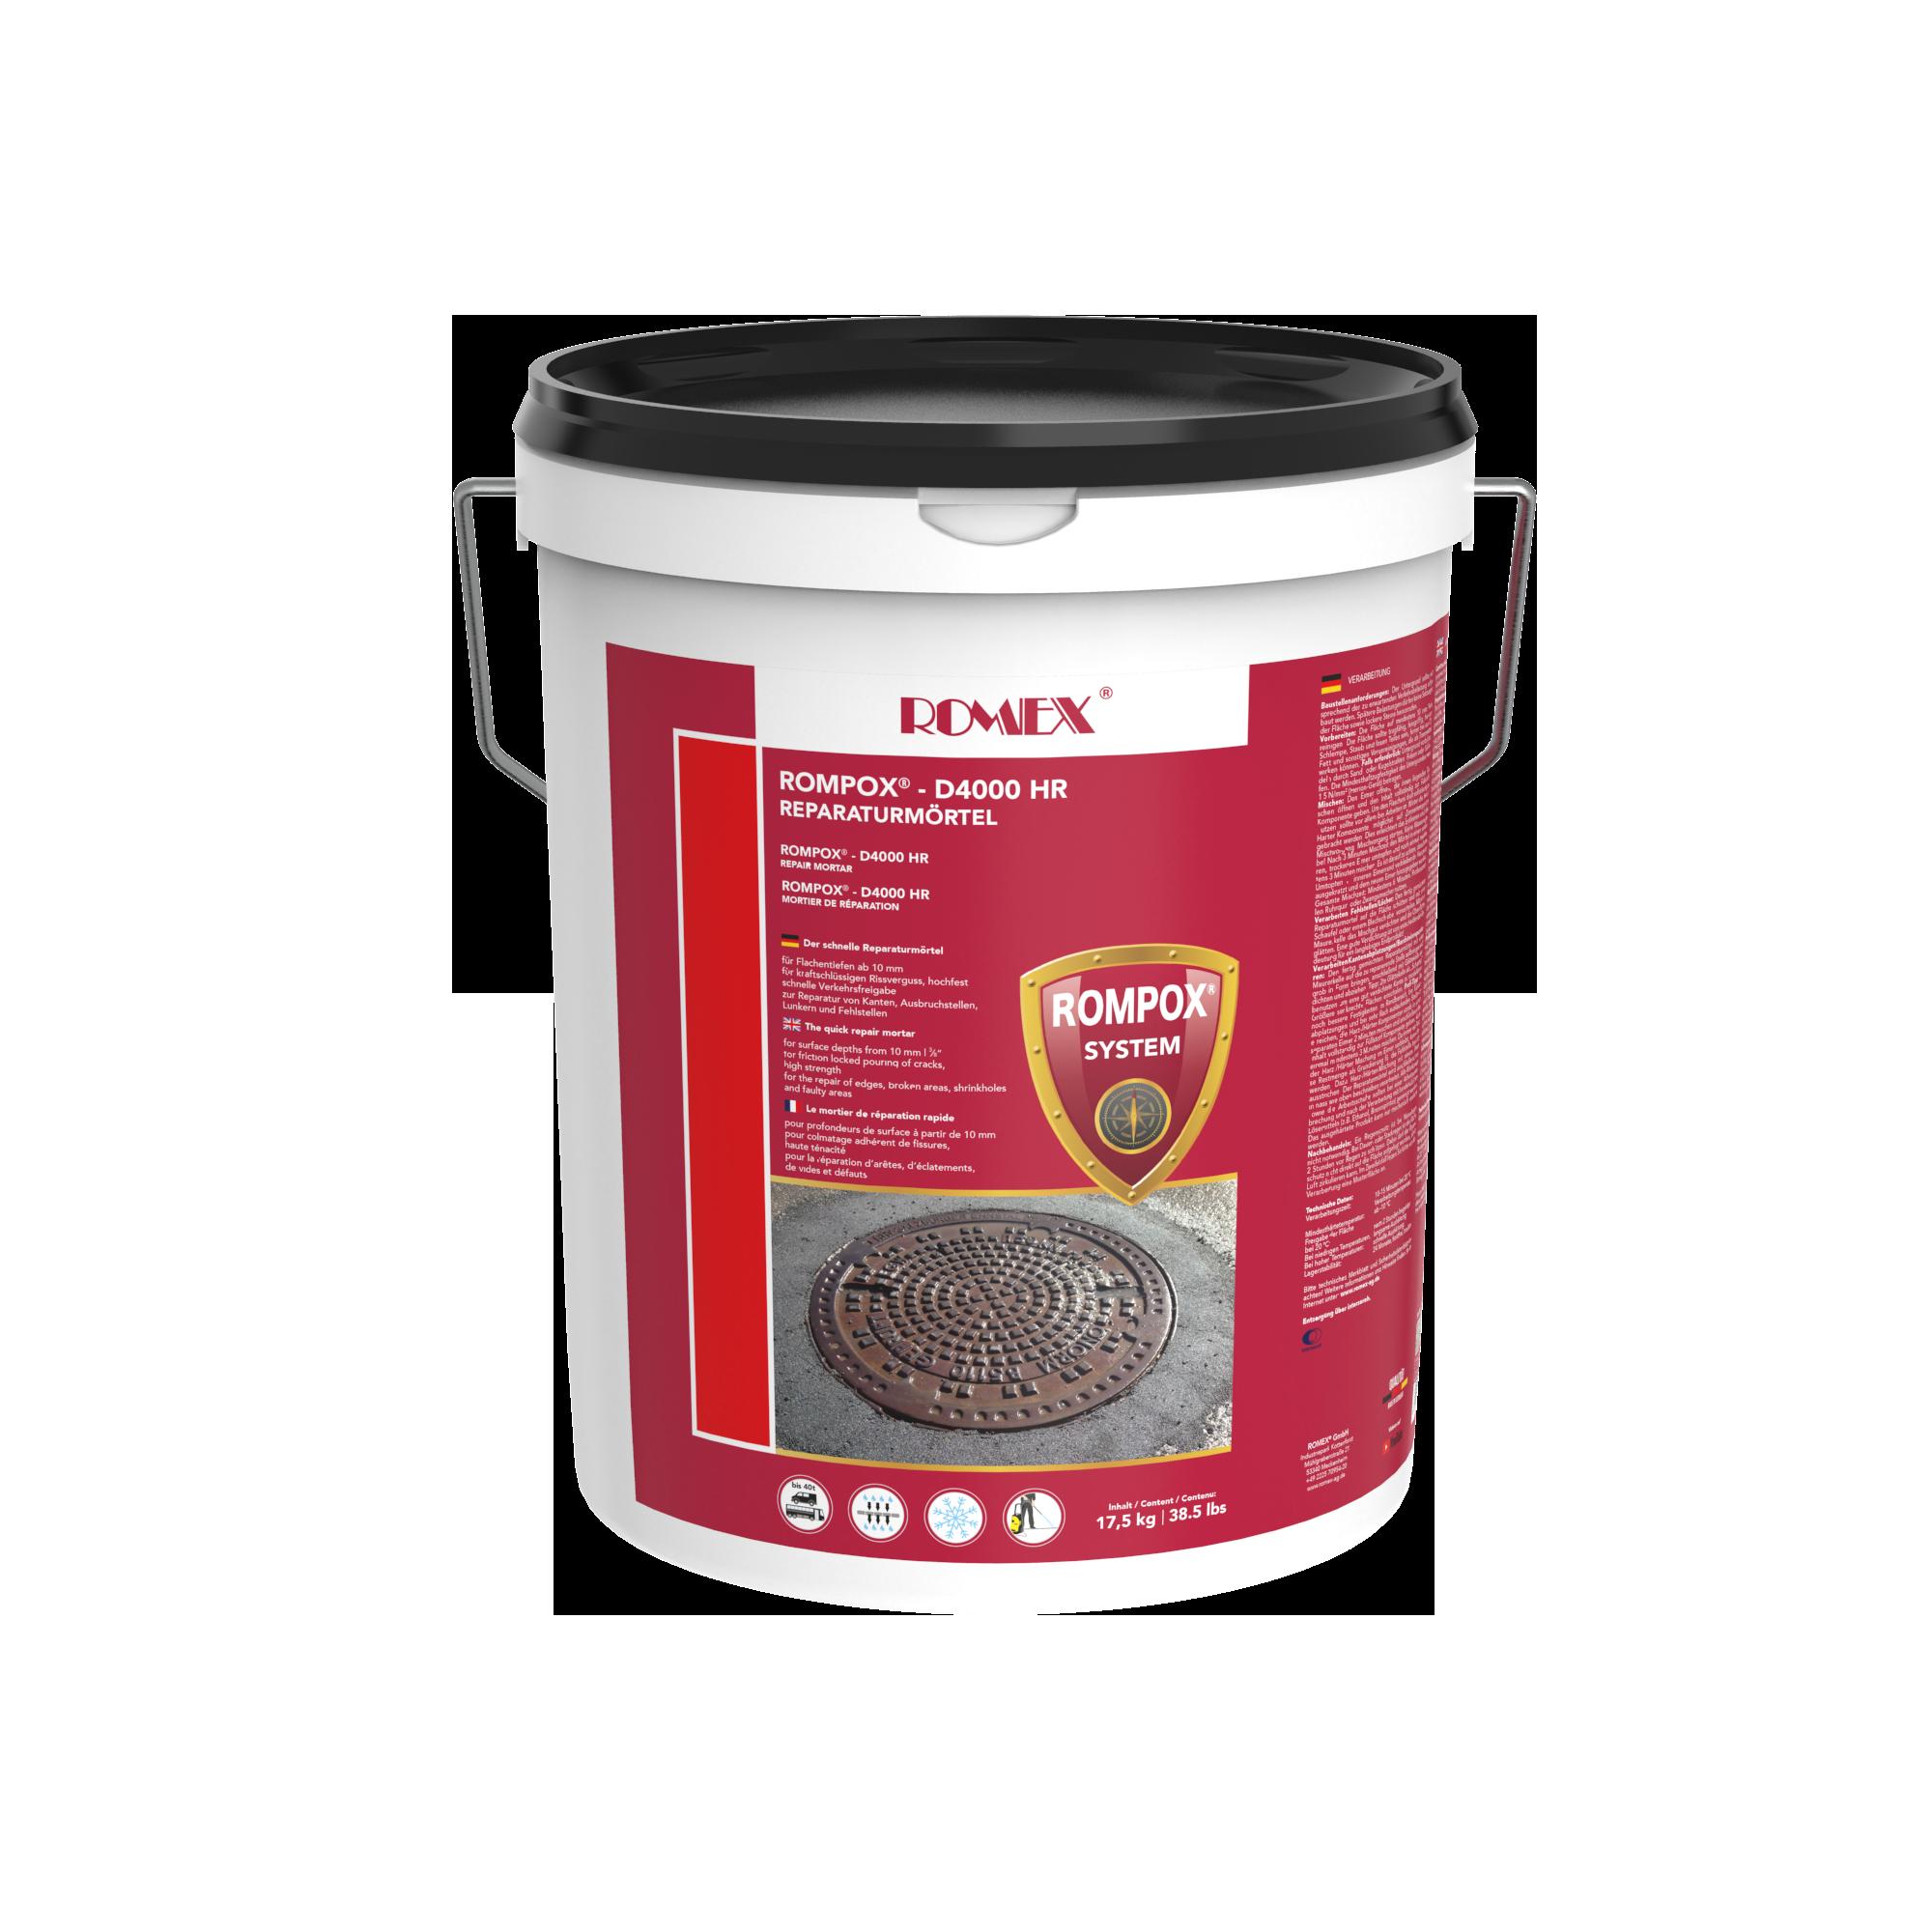 ROMPOX® - D4000 HR basalt